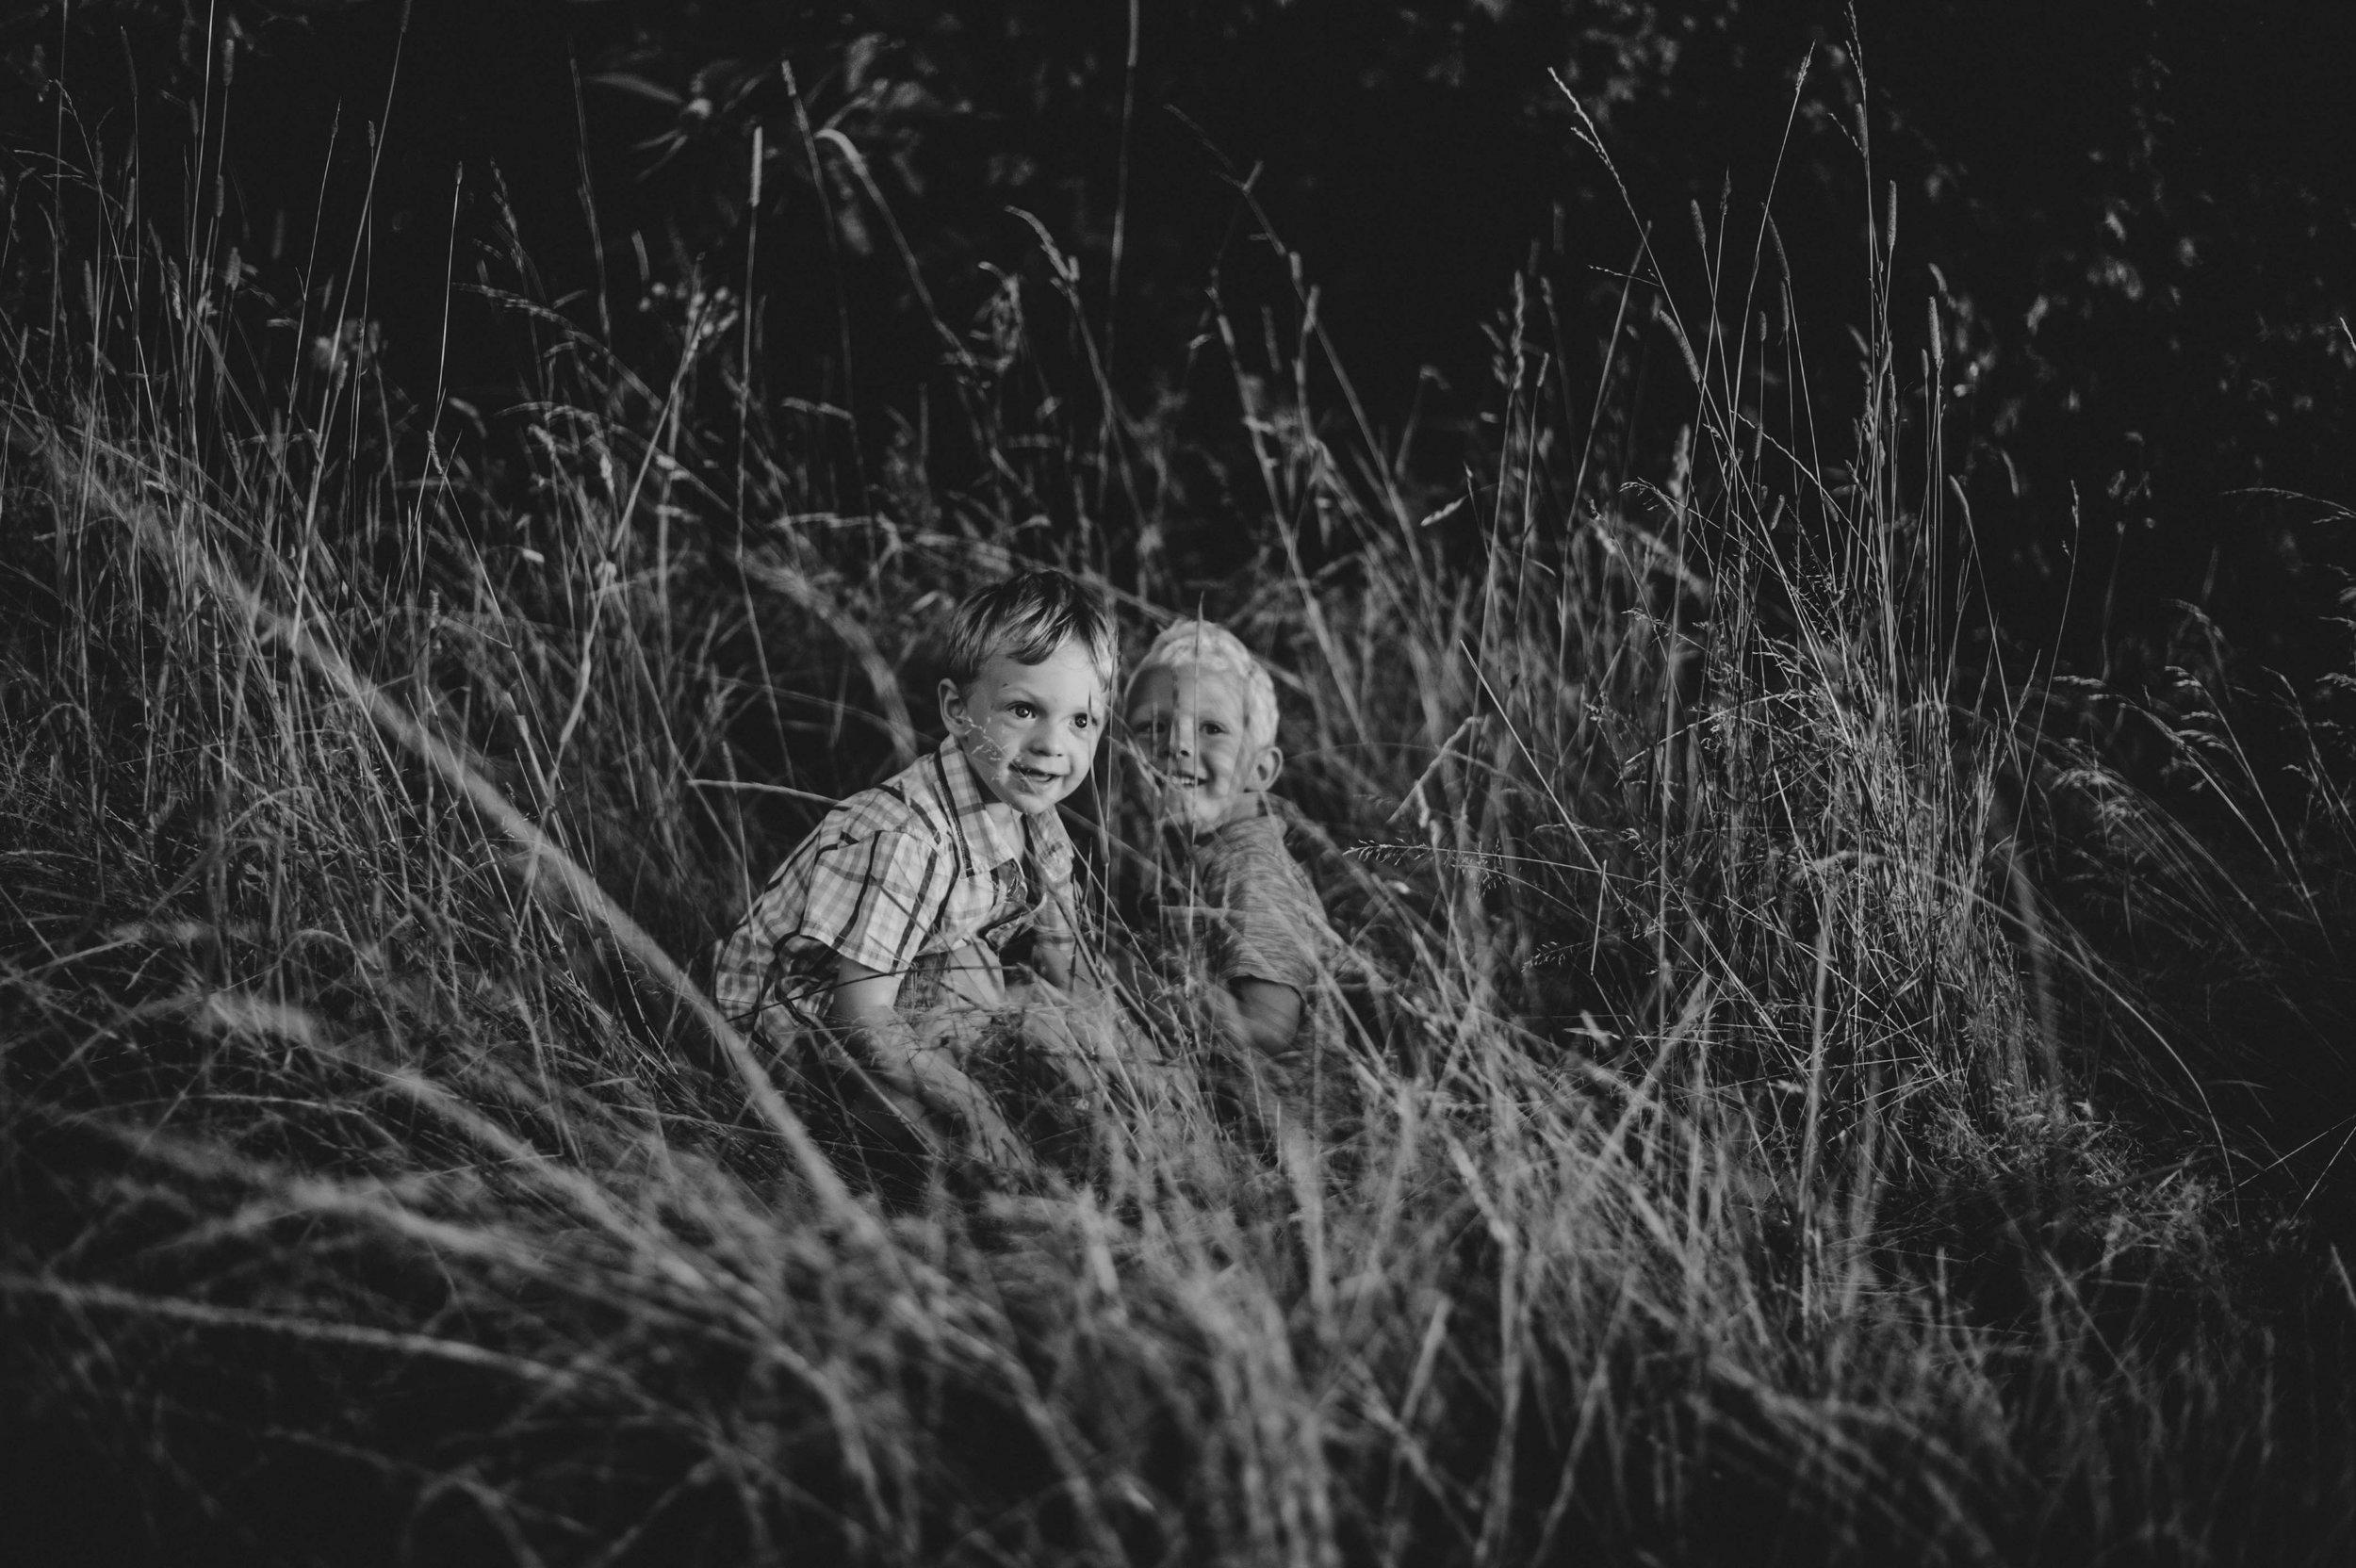 Sunset Golden Hour Summer Family Lifestyle Shoot Essex UK Documentary Portrait Photographer